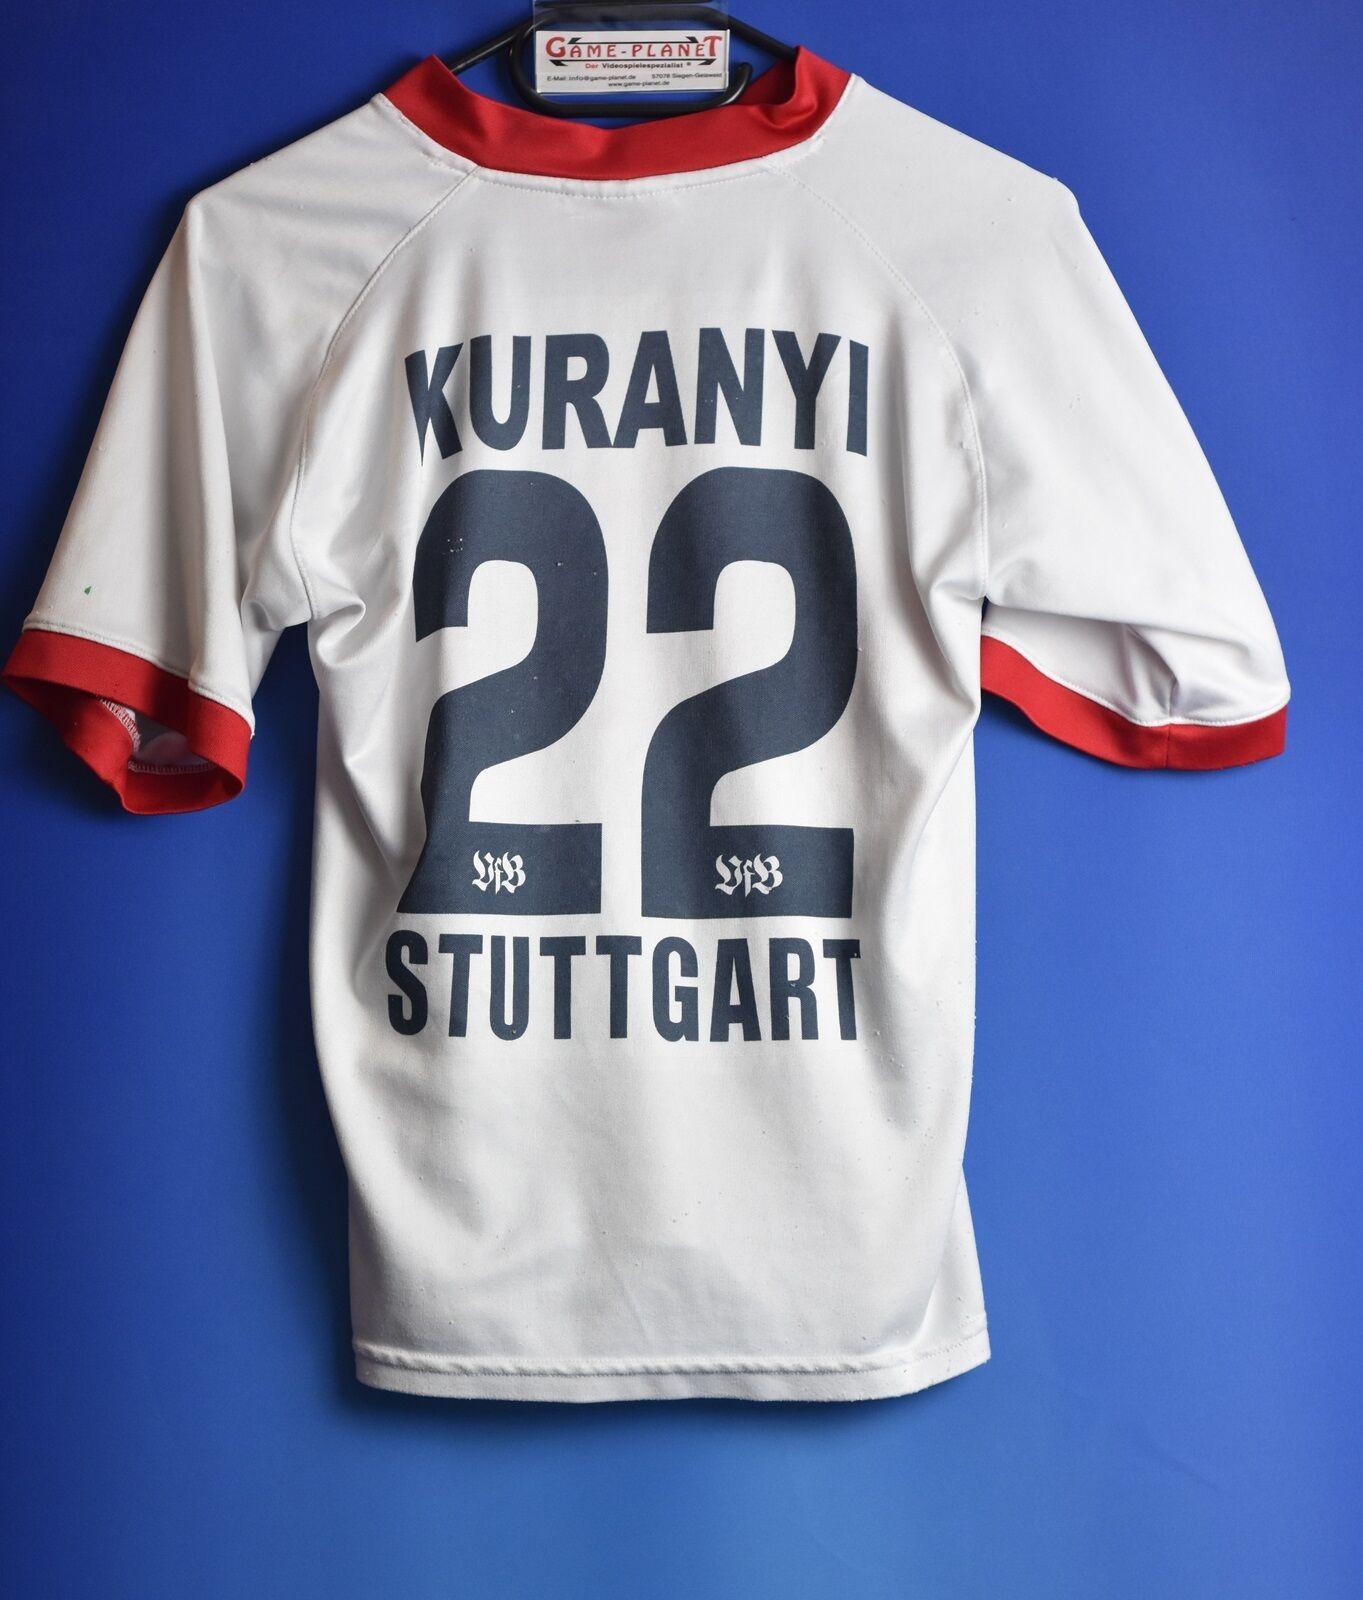 Trikot VfB Stuttgart signiert Gr.164 Bundesliga Trikot Trikot Trikot Liga 1 Unterschriften b7f8c7